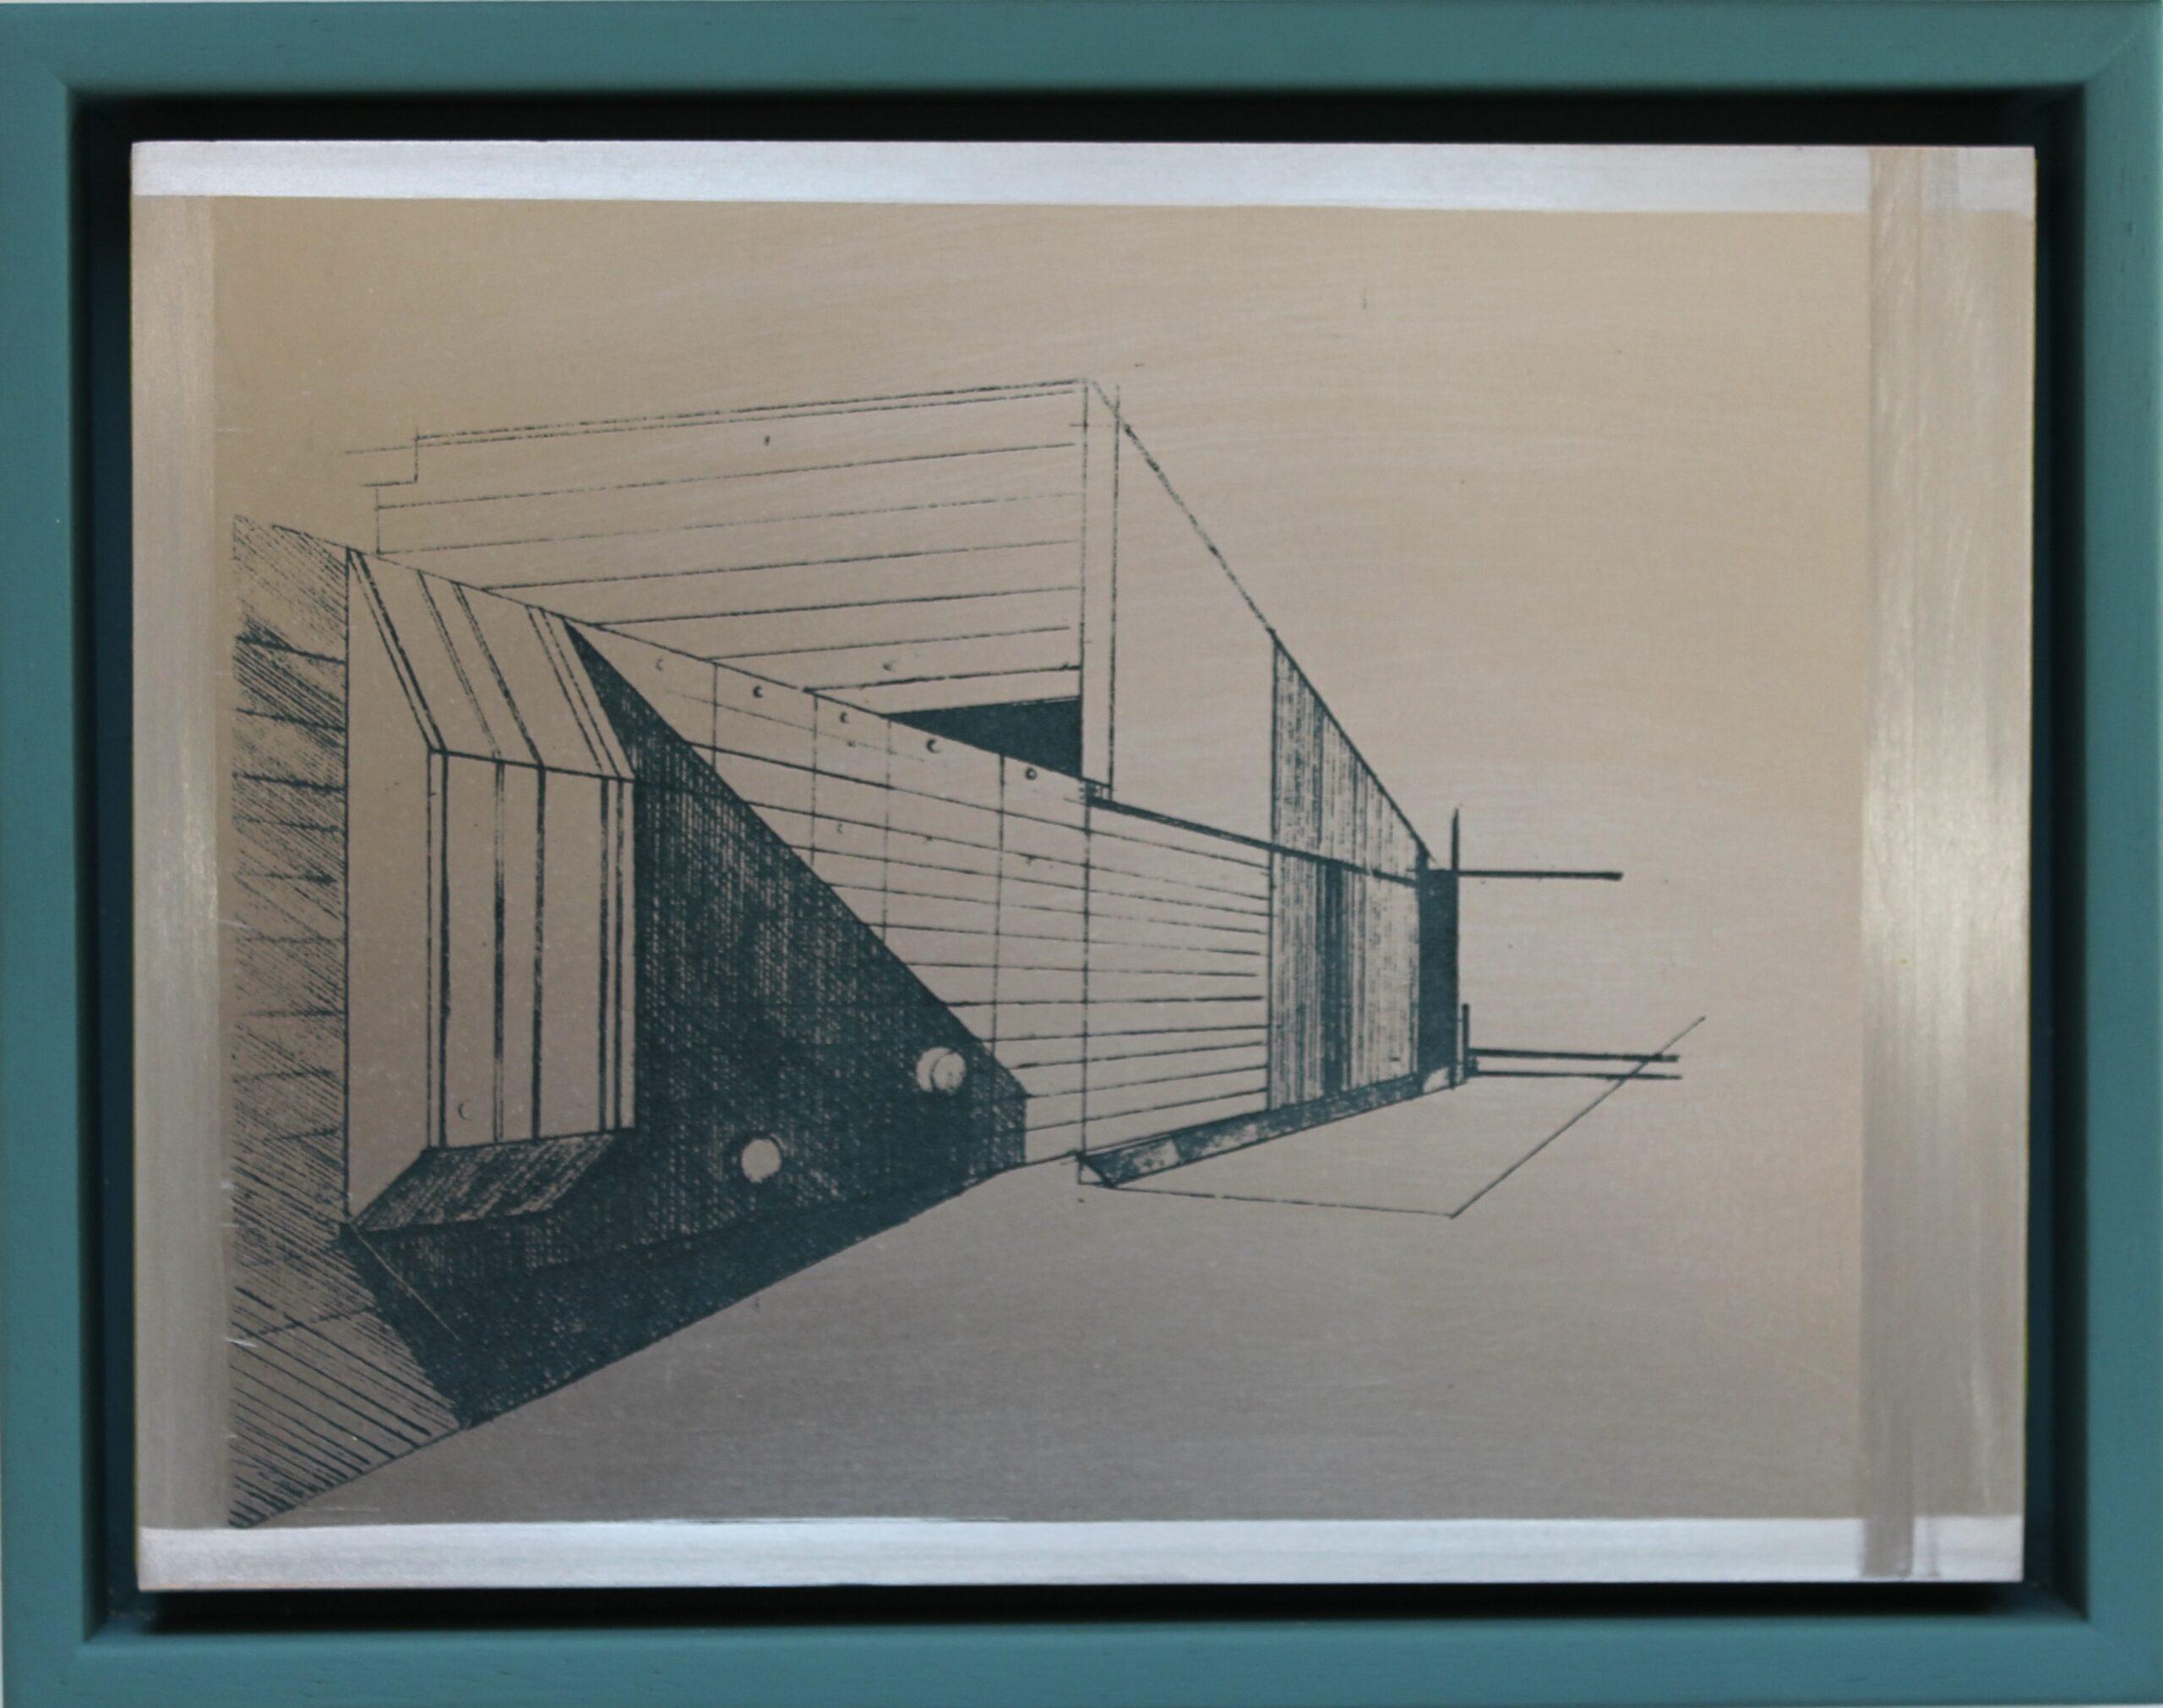 Margot Galvin_ Design-123- Screenprint-on-aluminium-2020 - Nua Collective - Artist